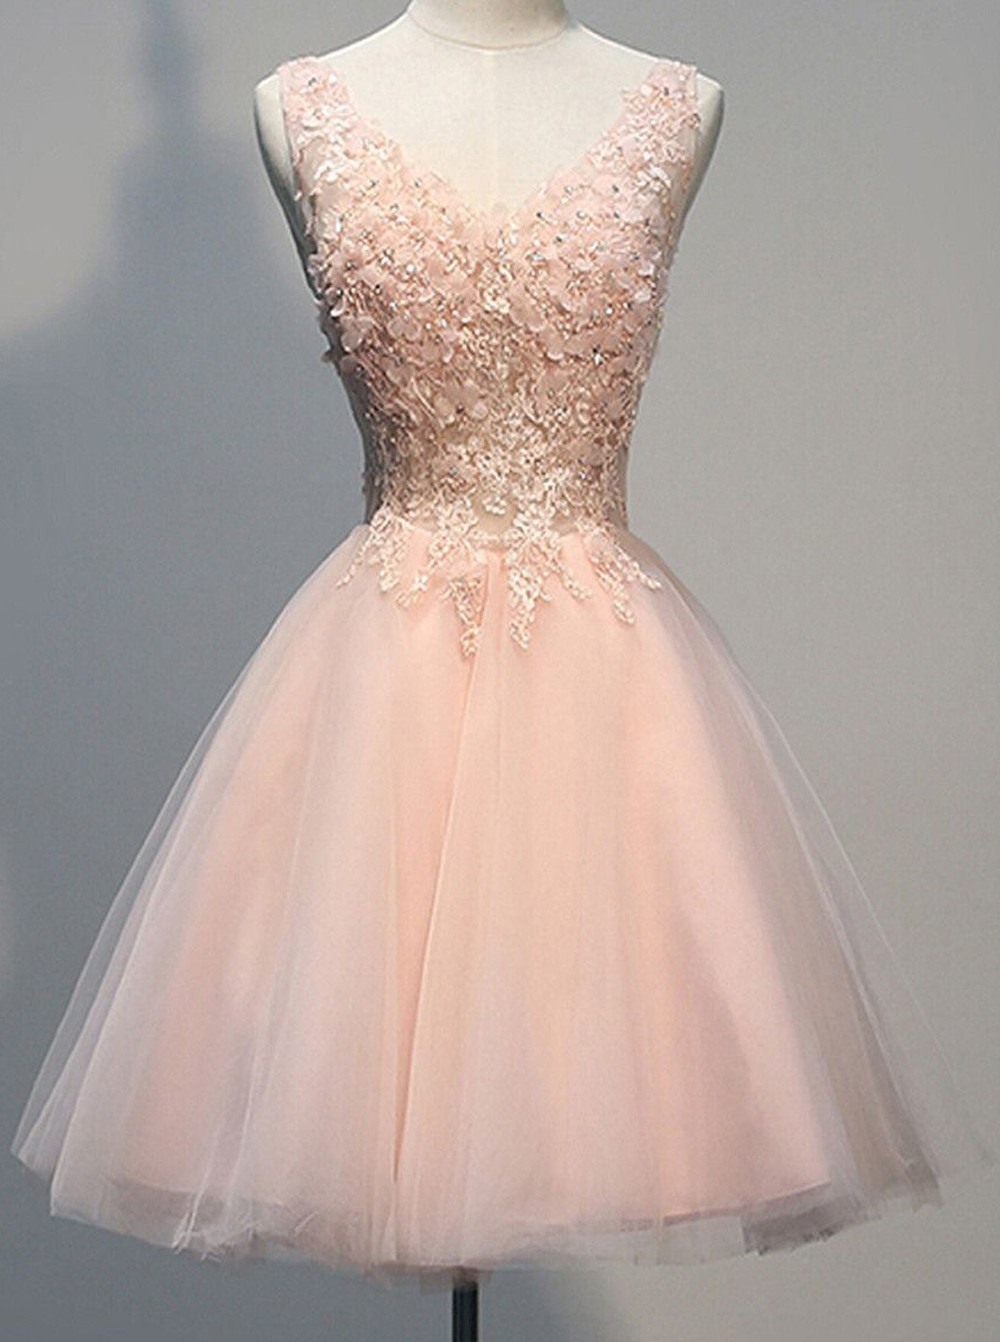 17 Schön Kleid Rosa Kurz Boutique13 Top Kleid Rosa Kurz Stylish